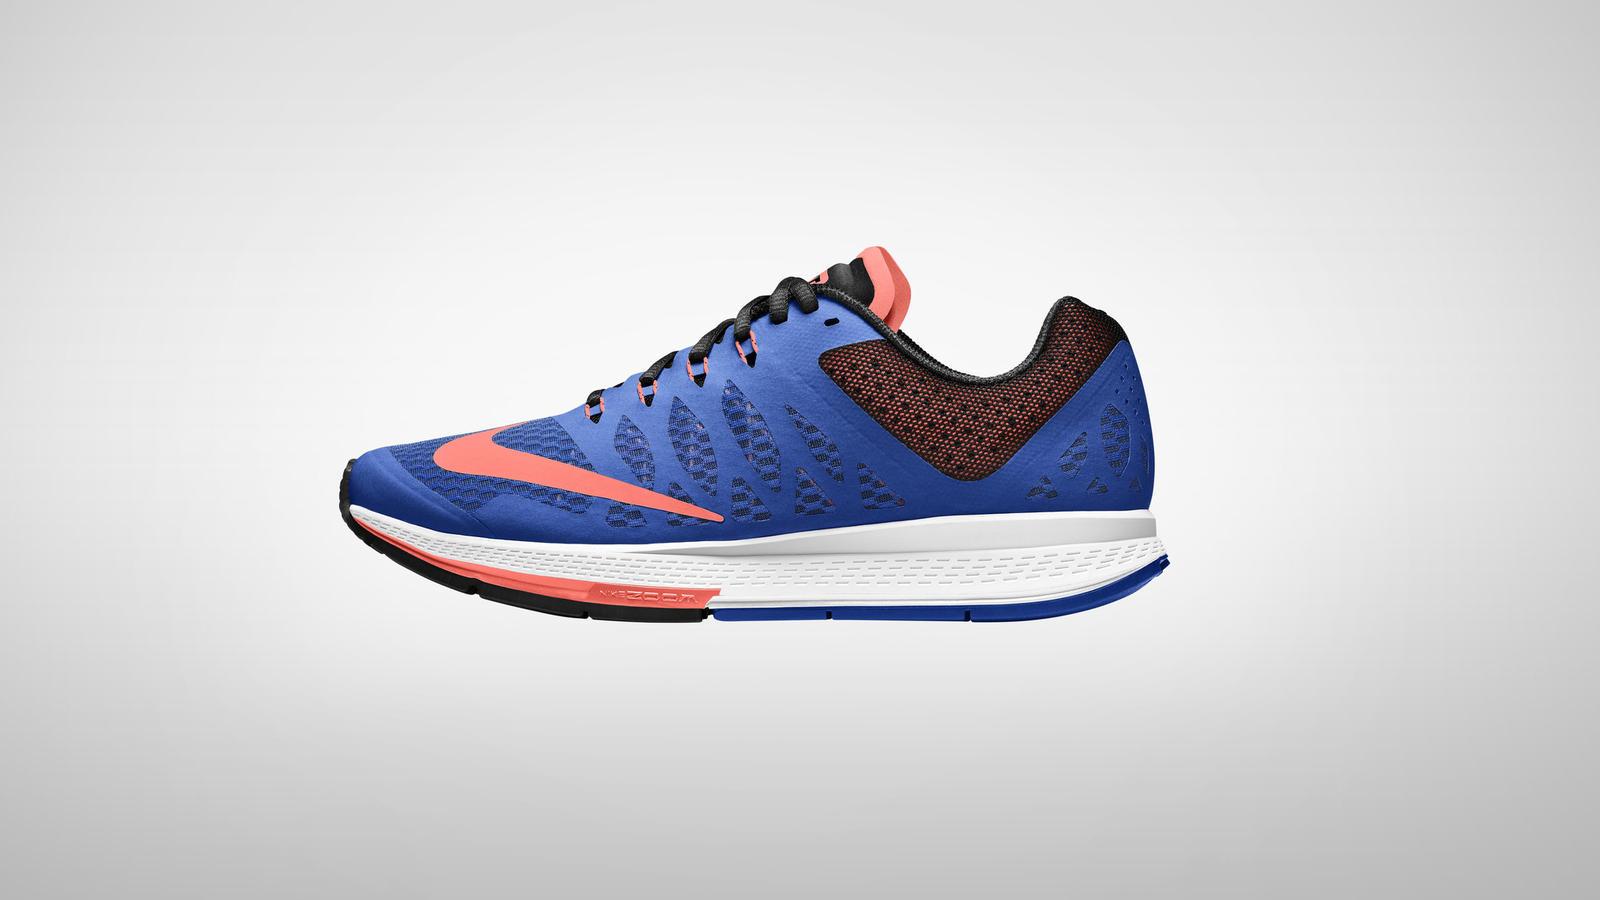 Sleek Women's Nike Blue Training Shoes